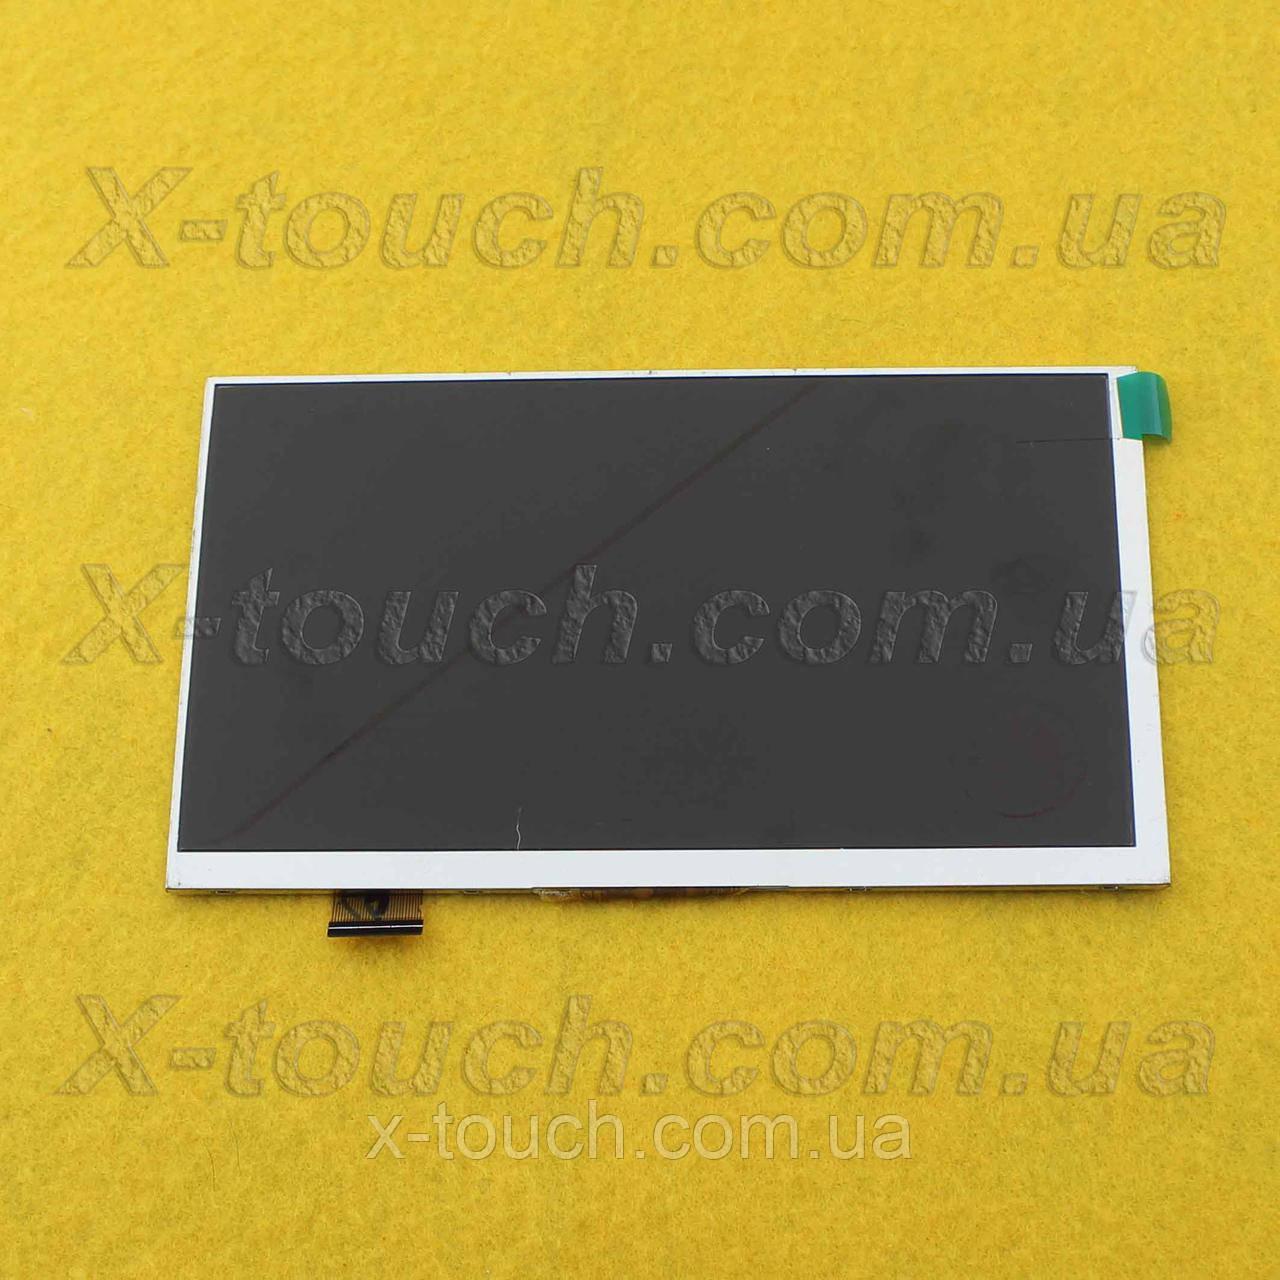 Матриця,екран, дисплей ARCHOS 70b Copper для планшета